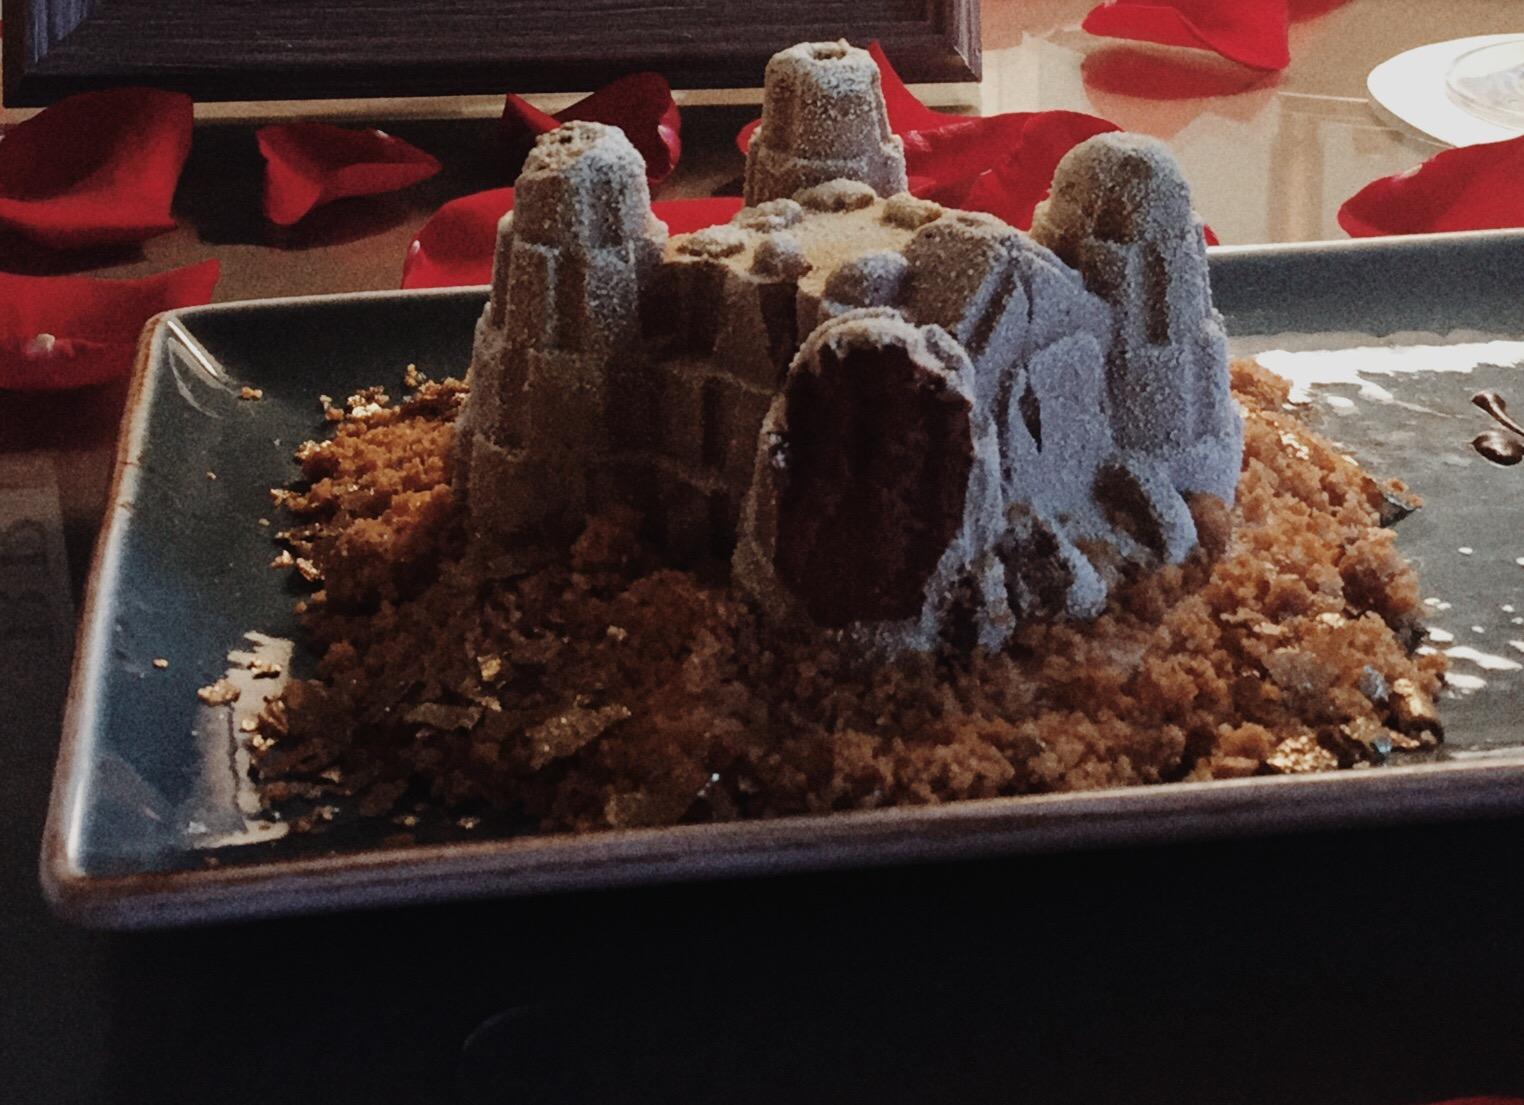 sand castle chocolate mousse